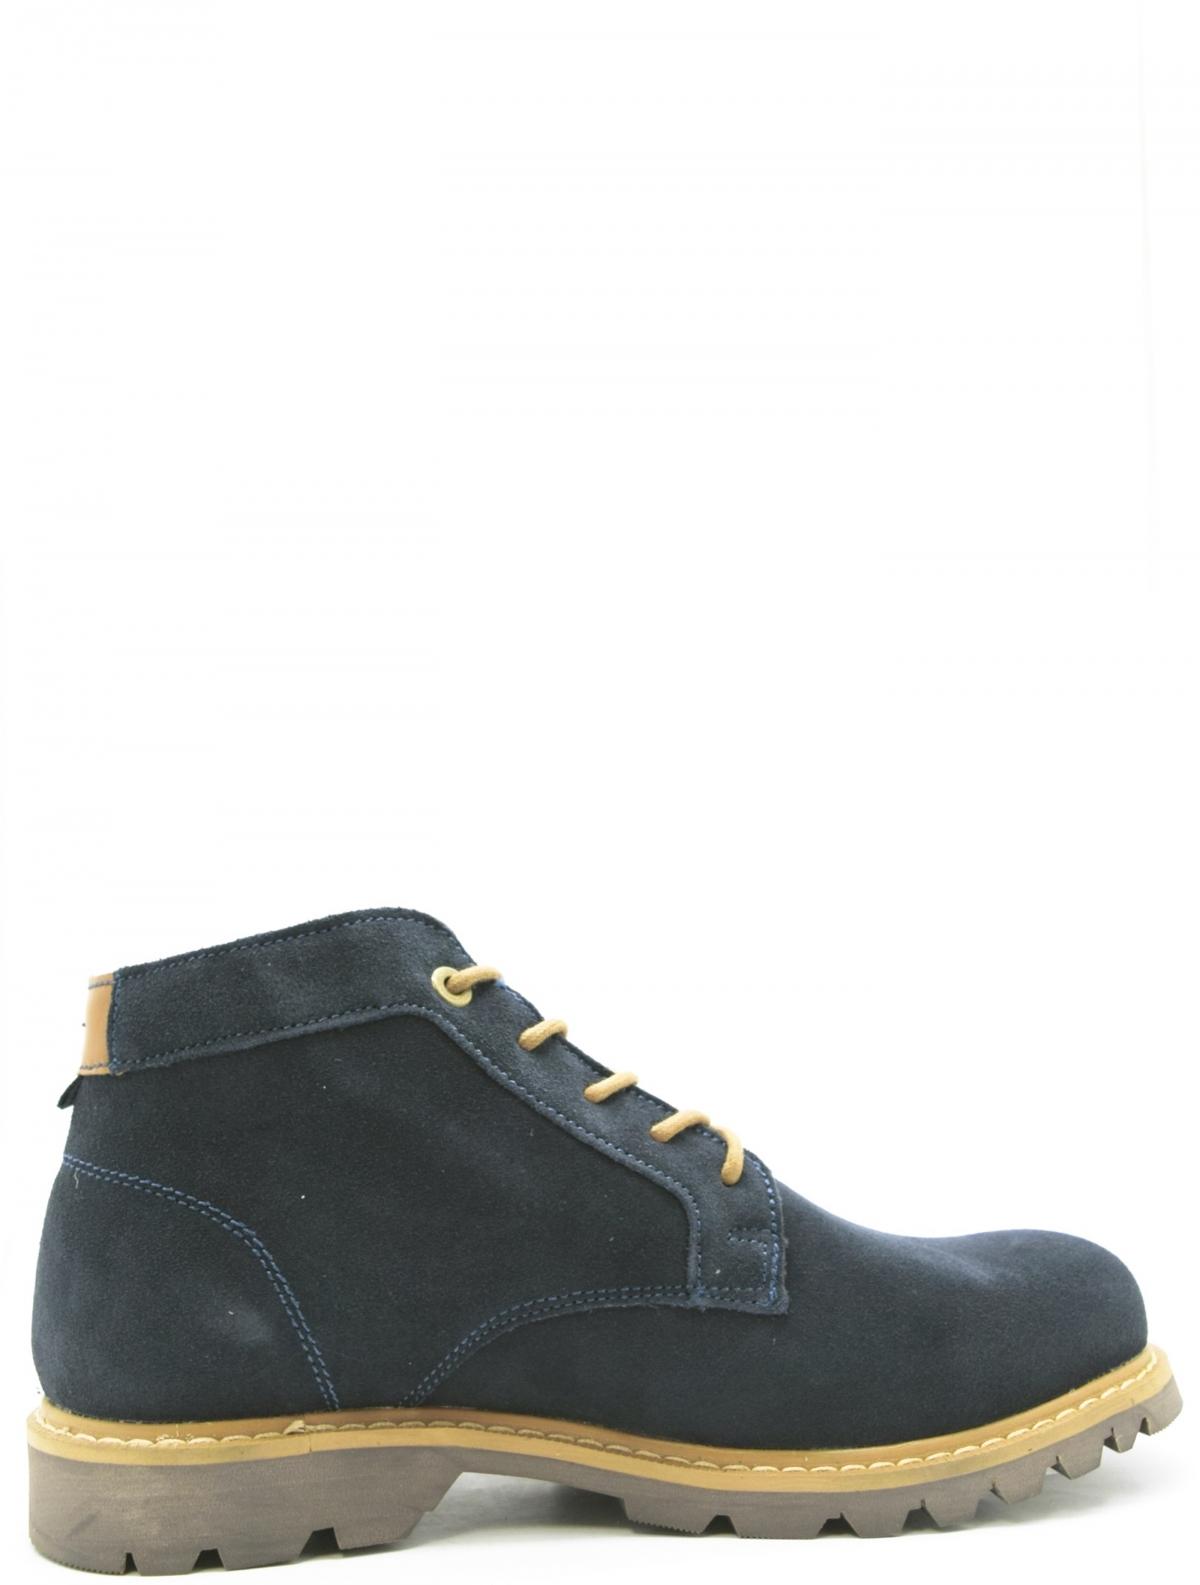 CROSBY 488573/01-01 мужские ботинки